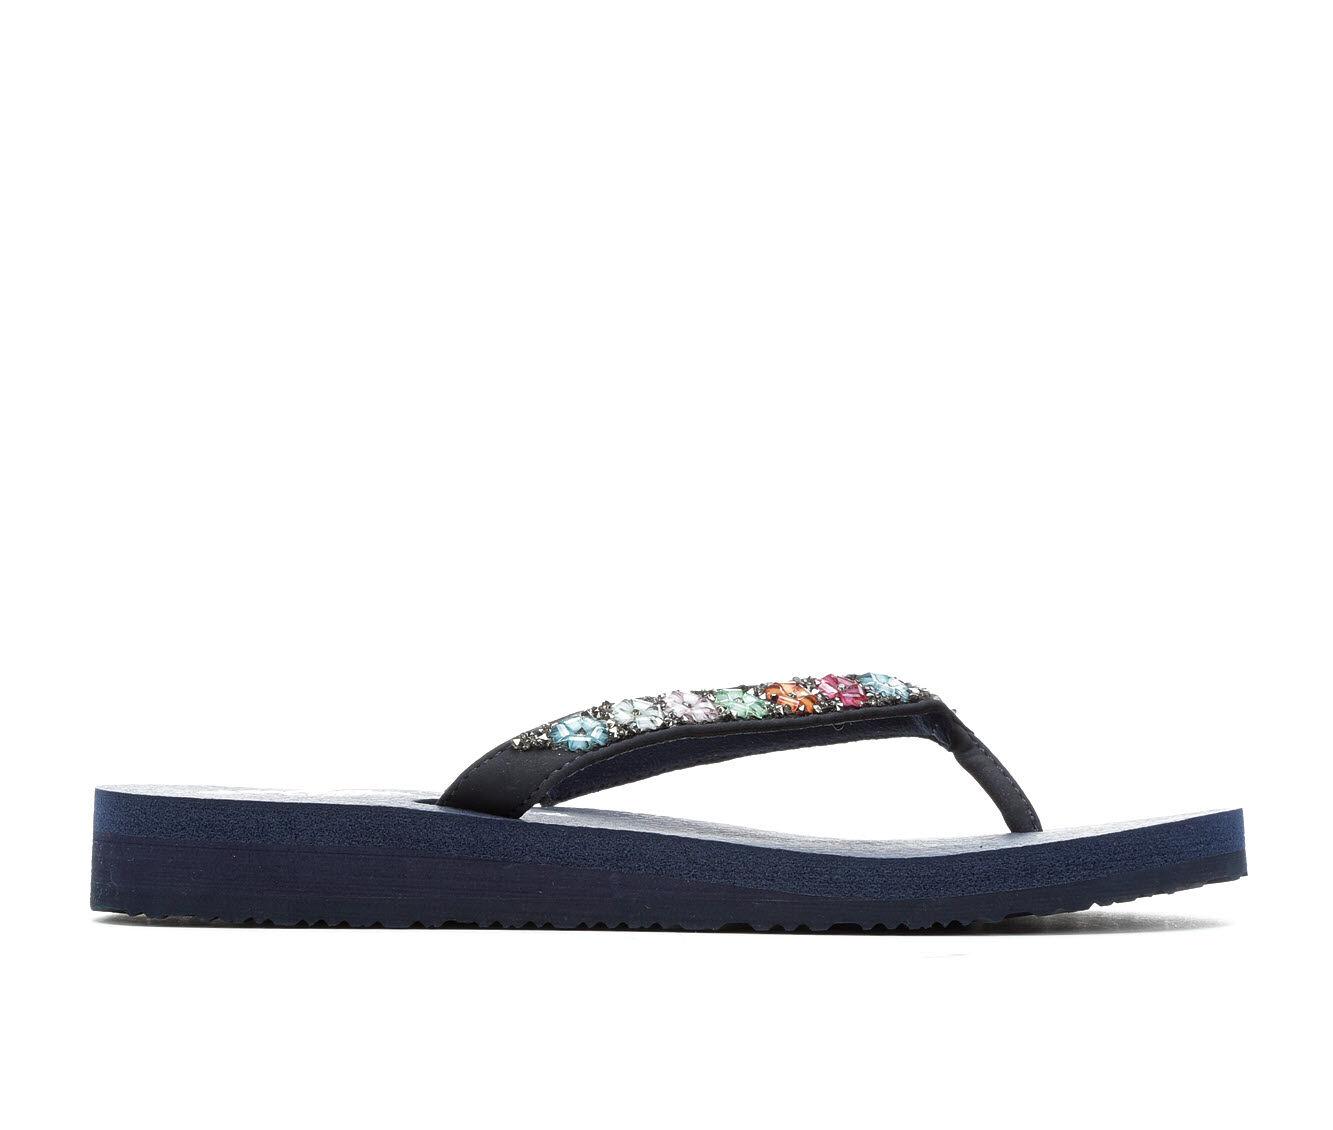 Women's Skechers Cali Daisy Delight 31559 Sandals Navy